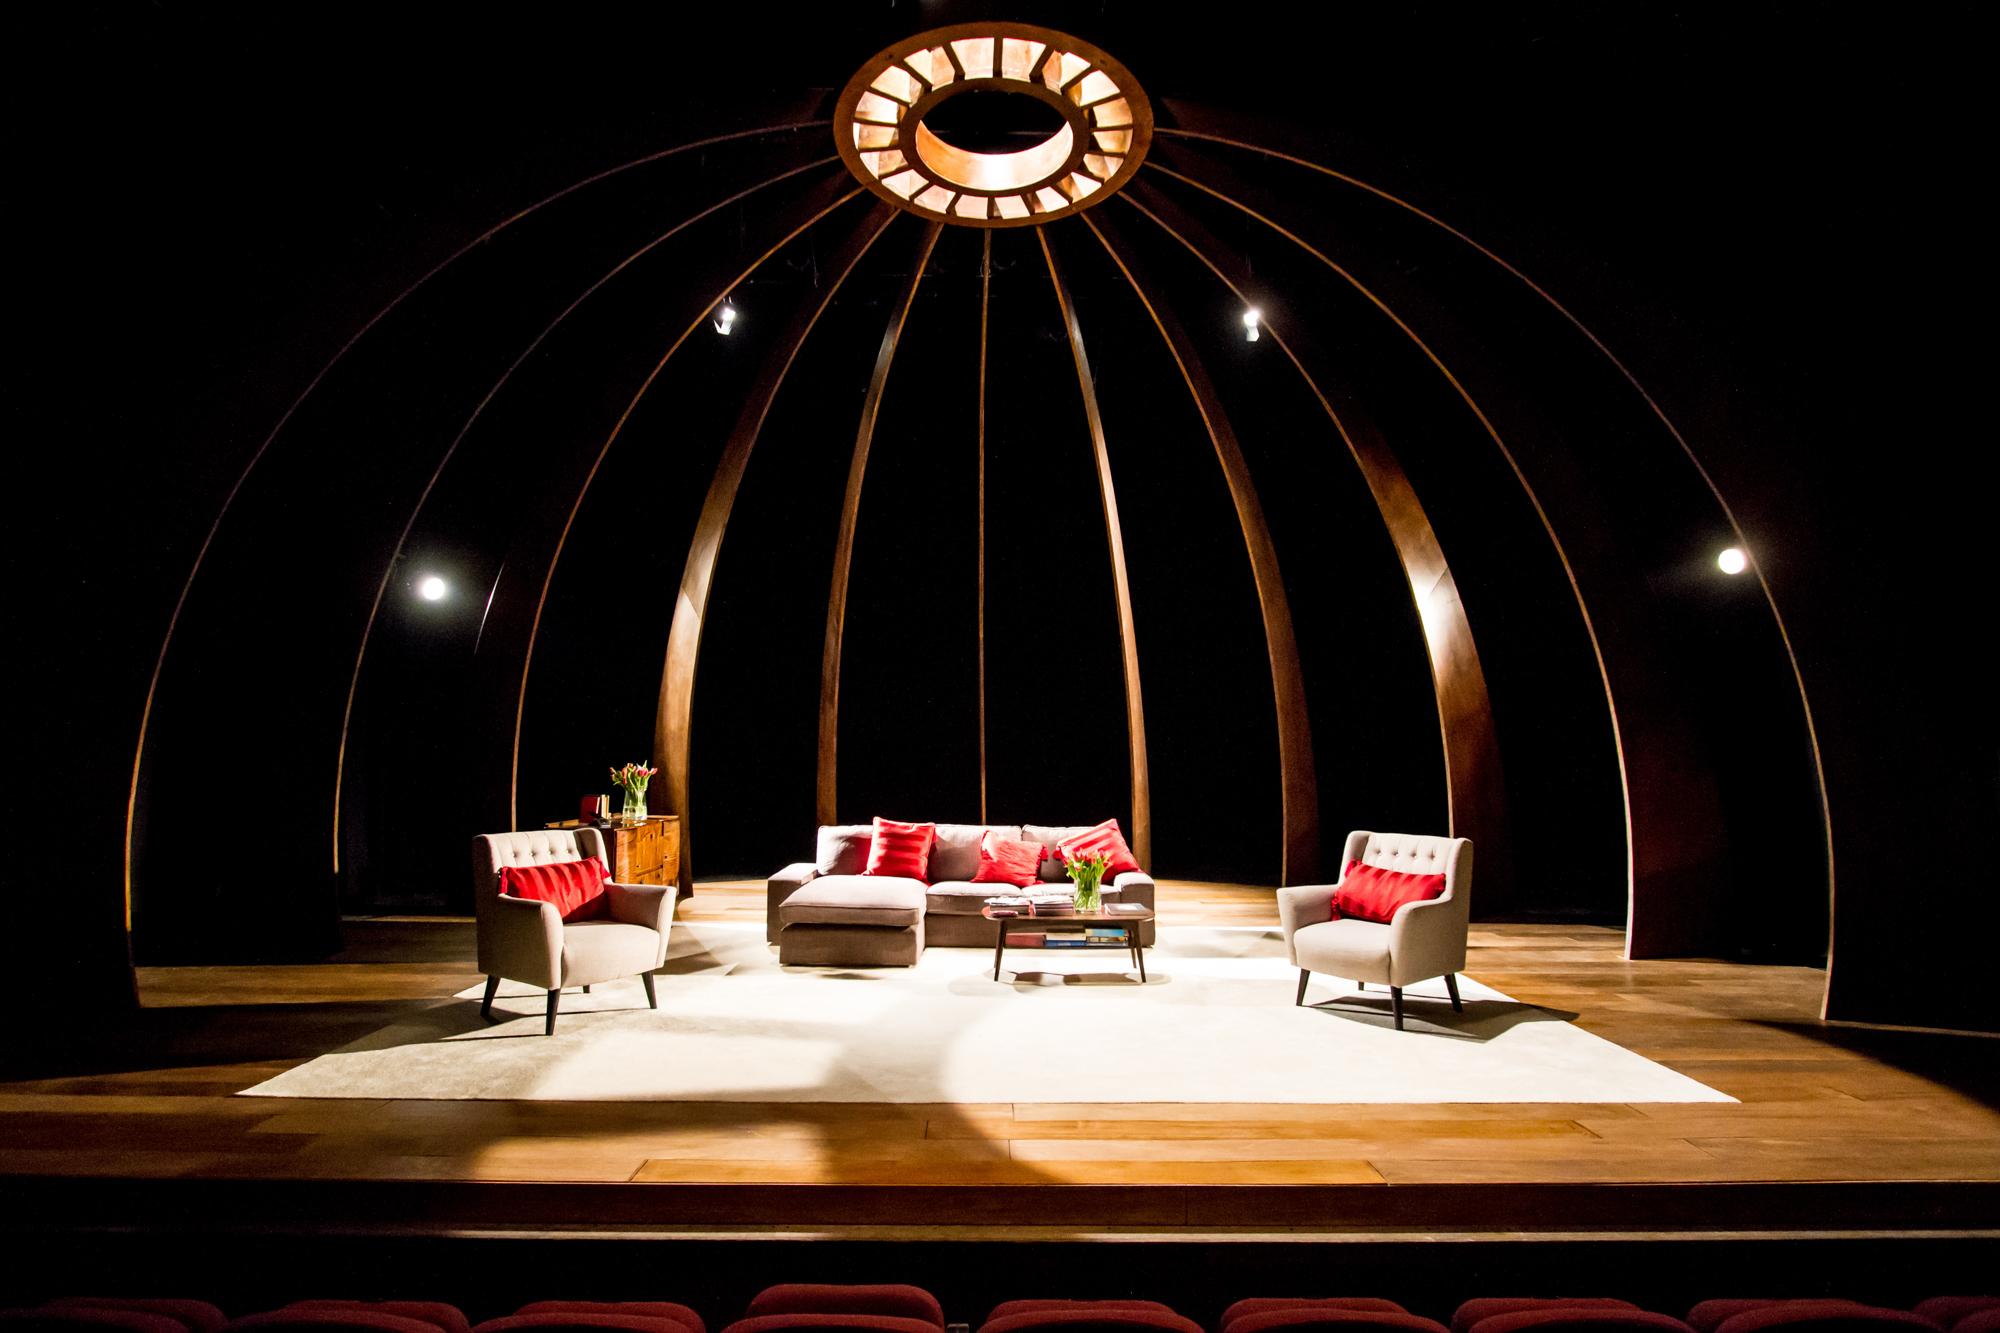 lighting design ryan crown august 09 2016 tinderbox theatre company